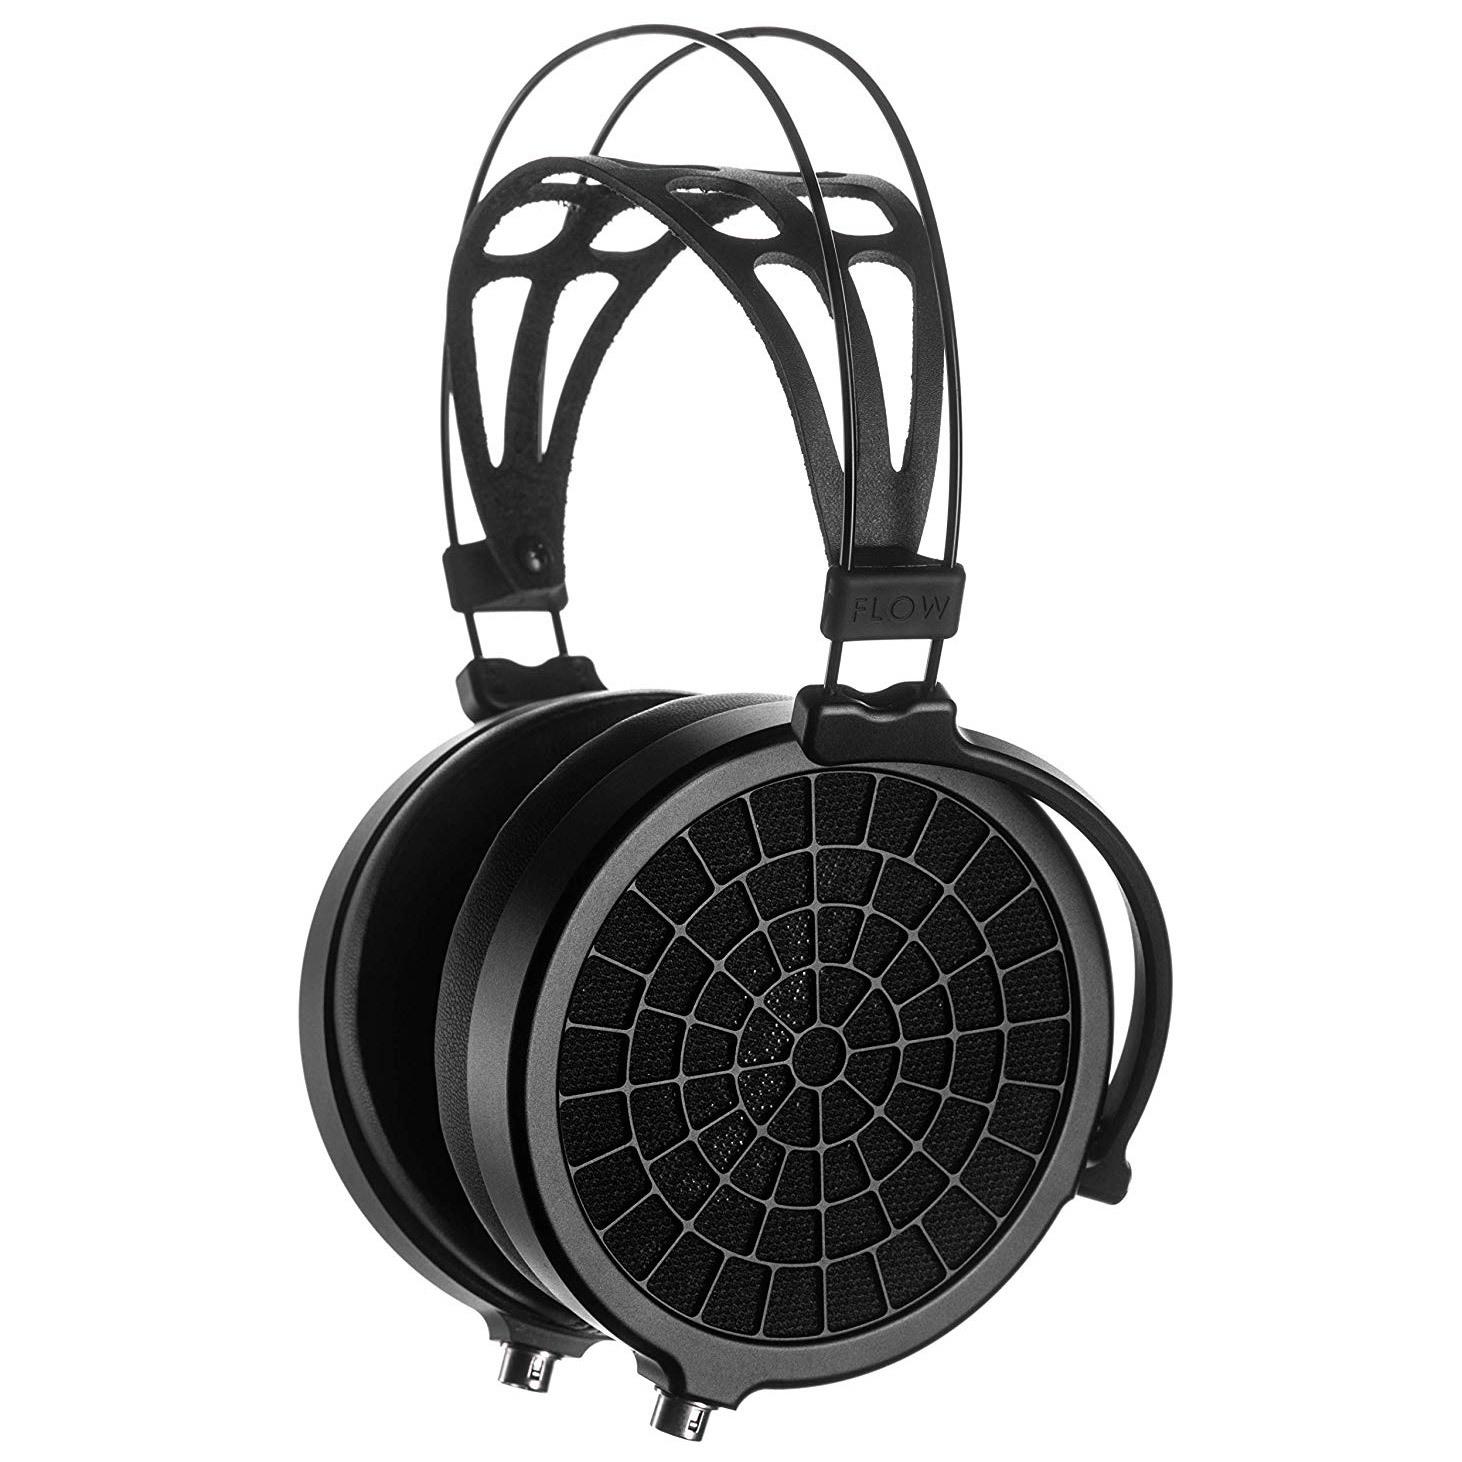 MrSpeakers Ether 2 review: true high-resolution headphones